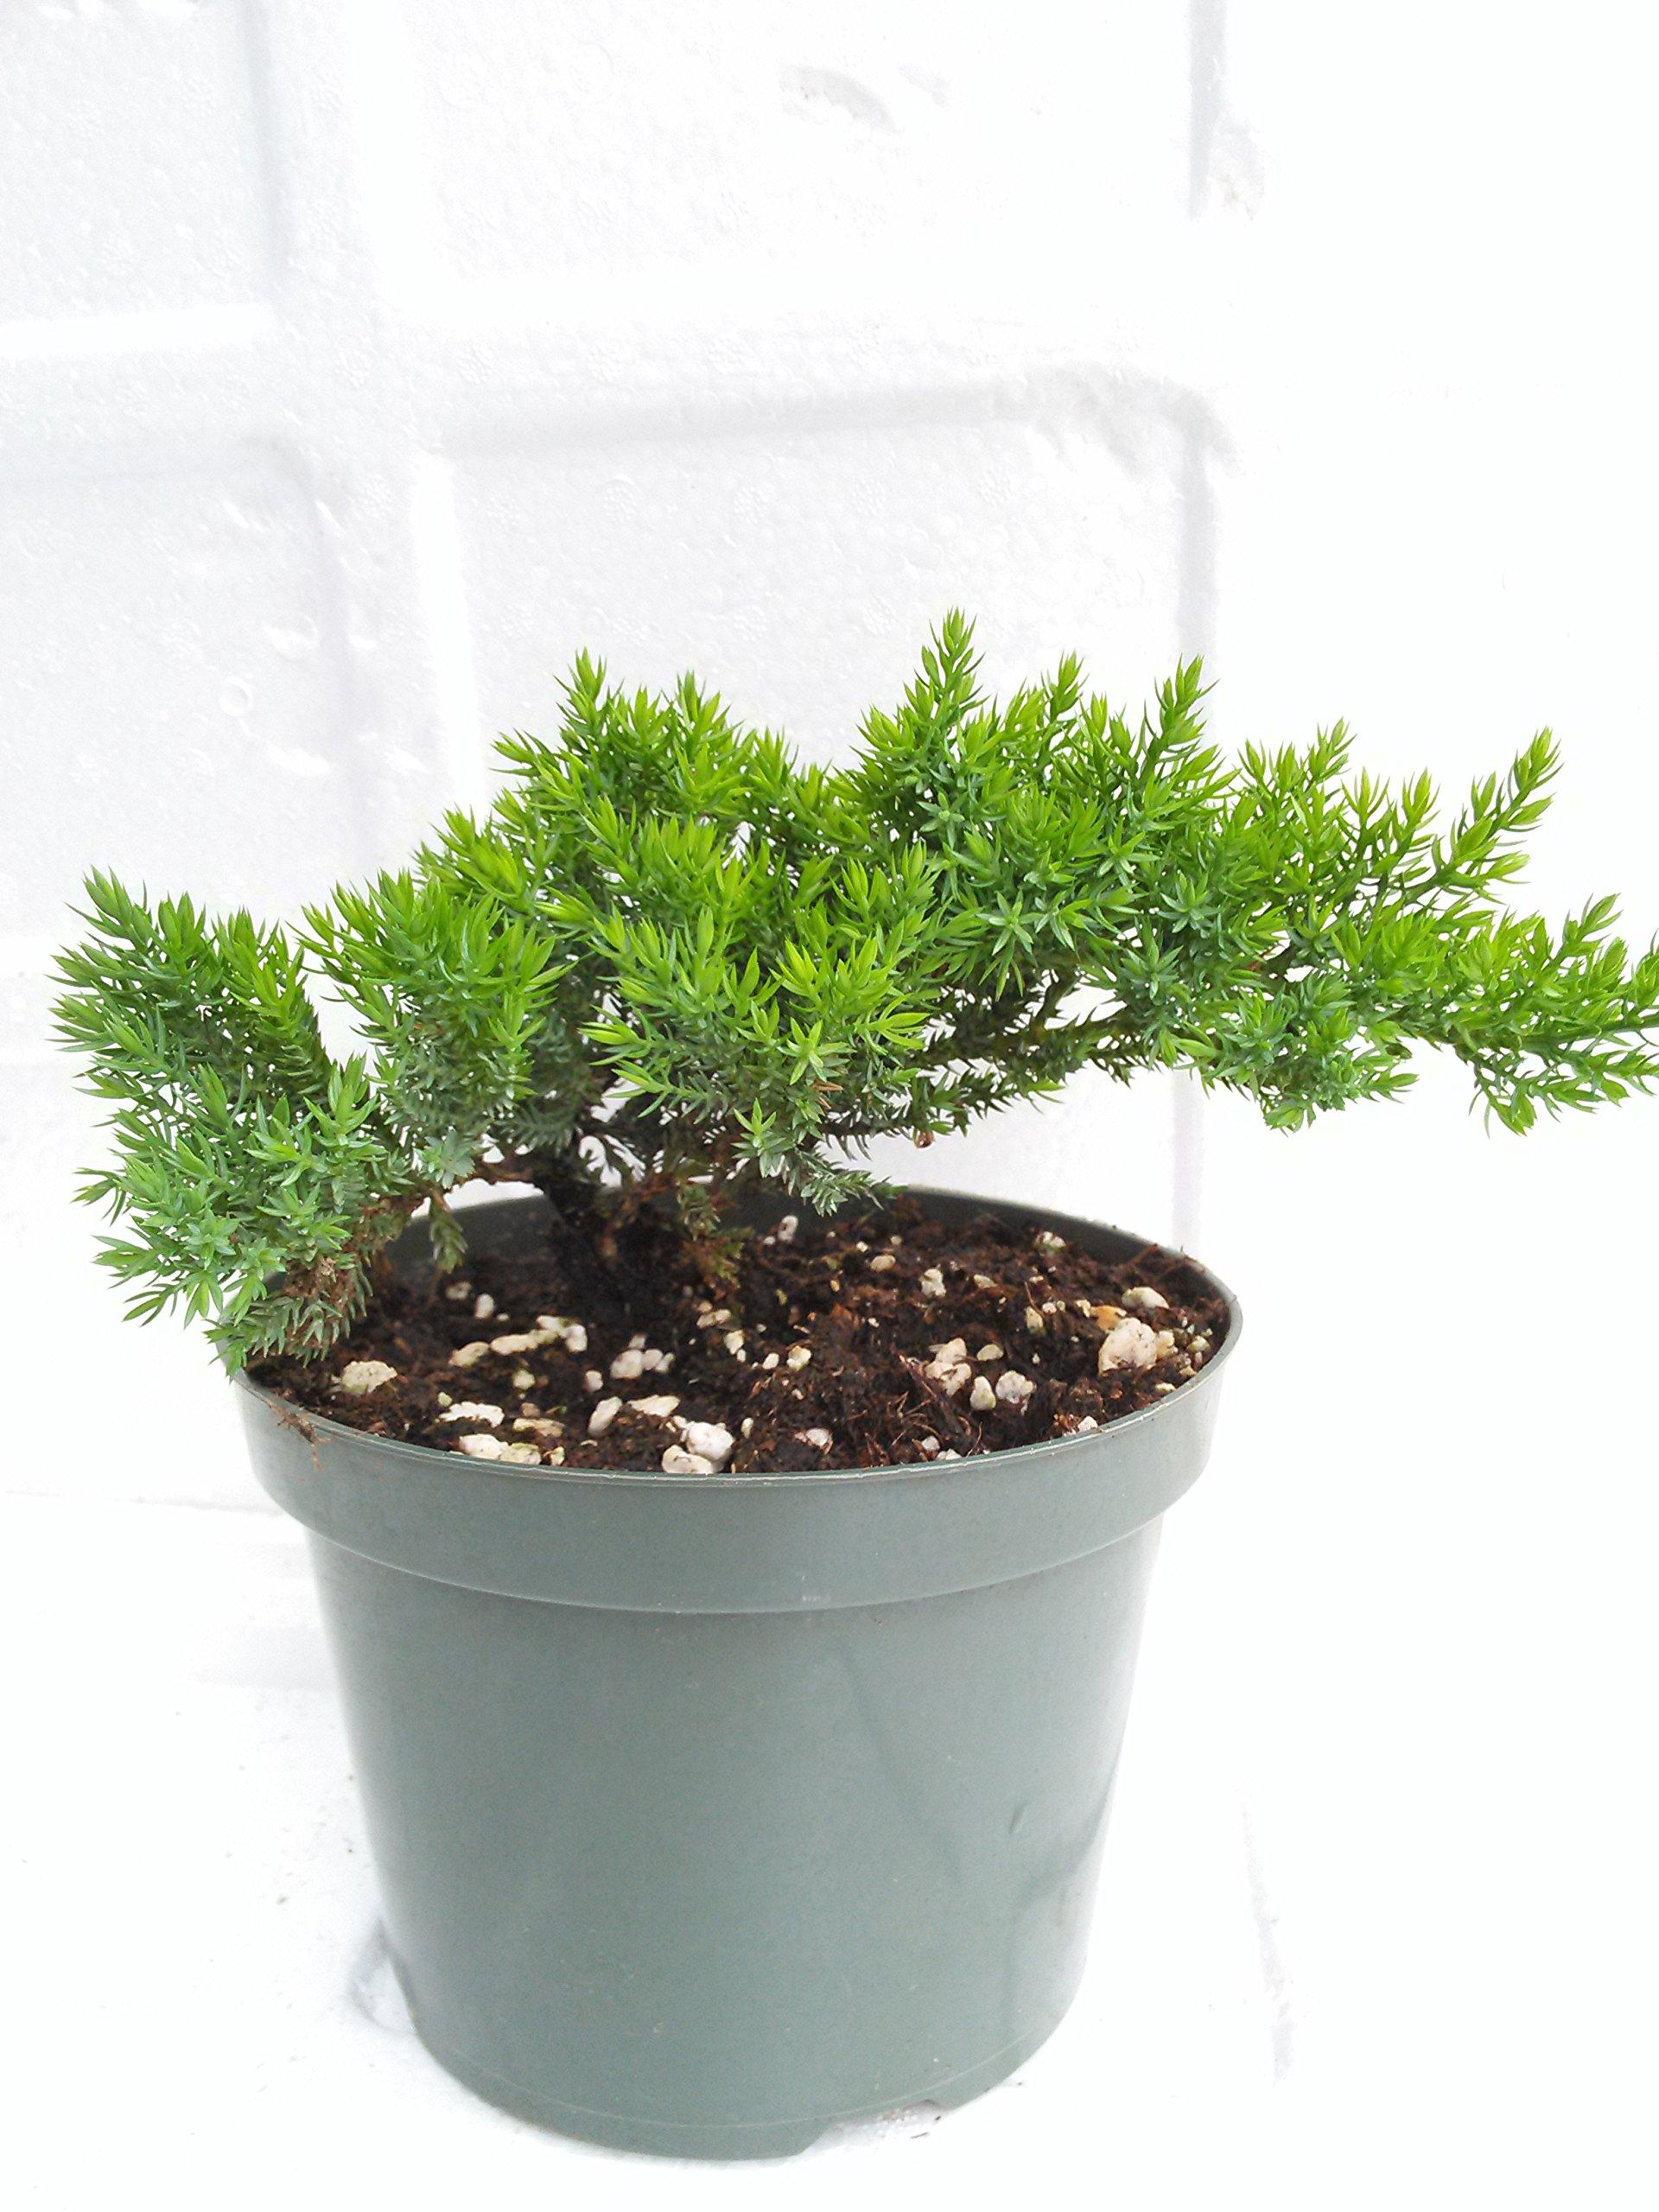 Tree Bonsai Juniper Garden 6'' Pot with Bonsai Fertilizer Slow Release unique from Jmbamboo